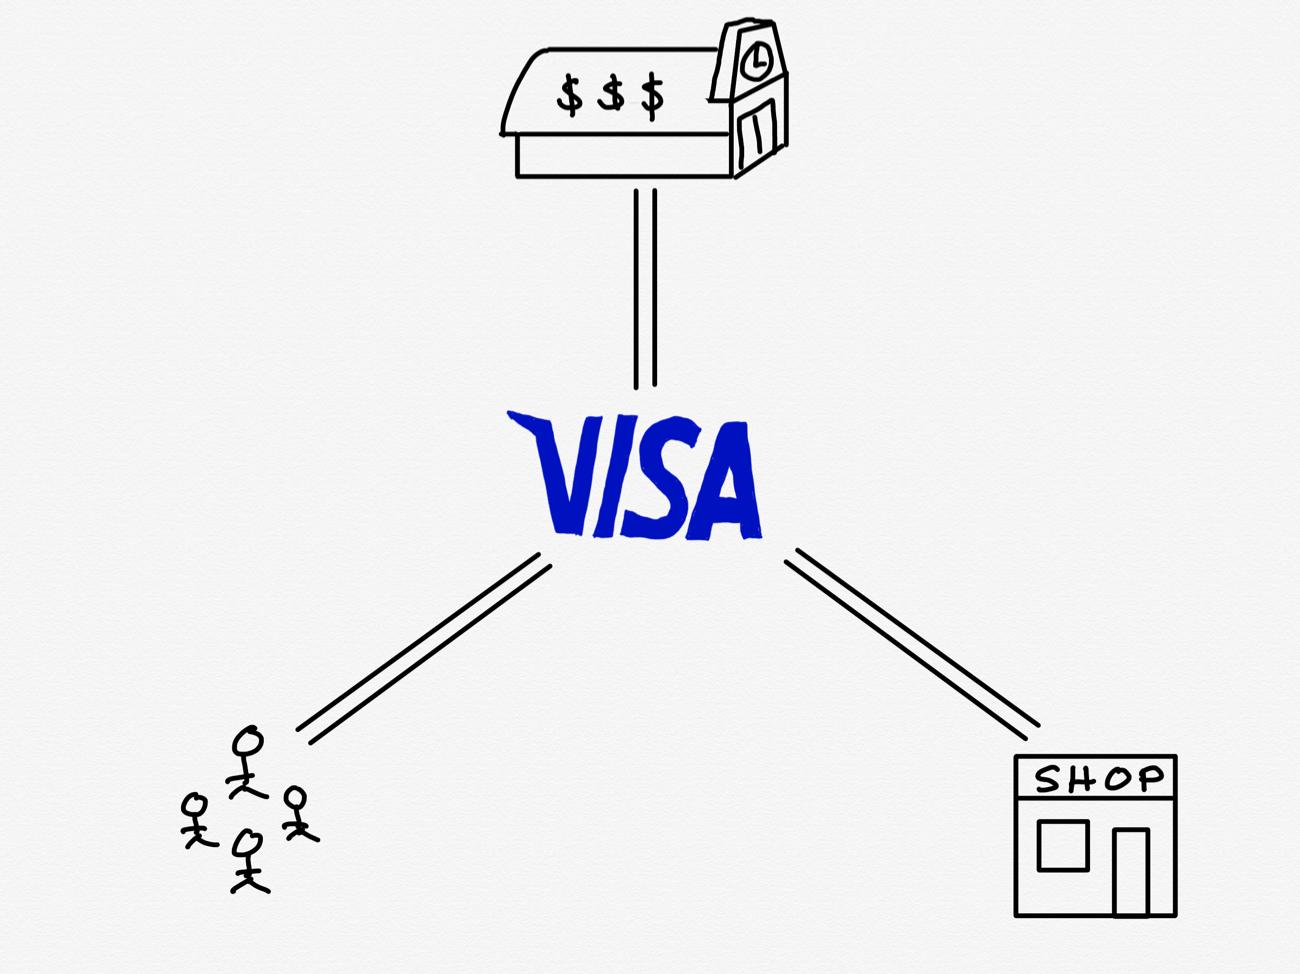 Visa, Plaid, Networks, and Jobs